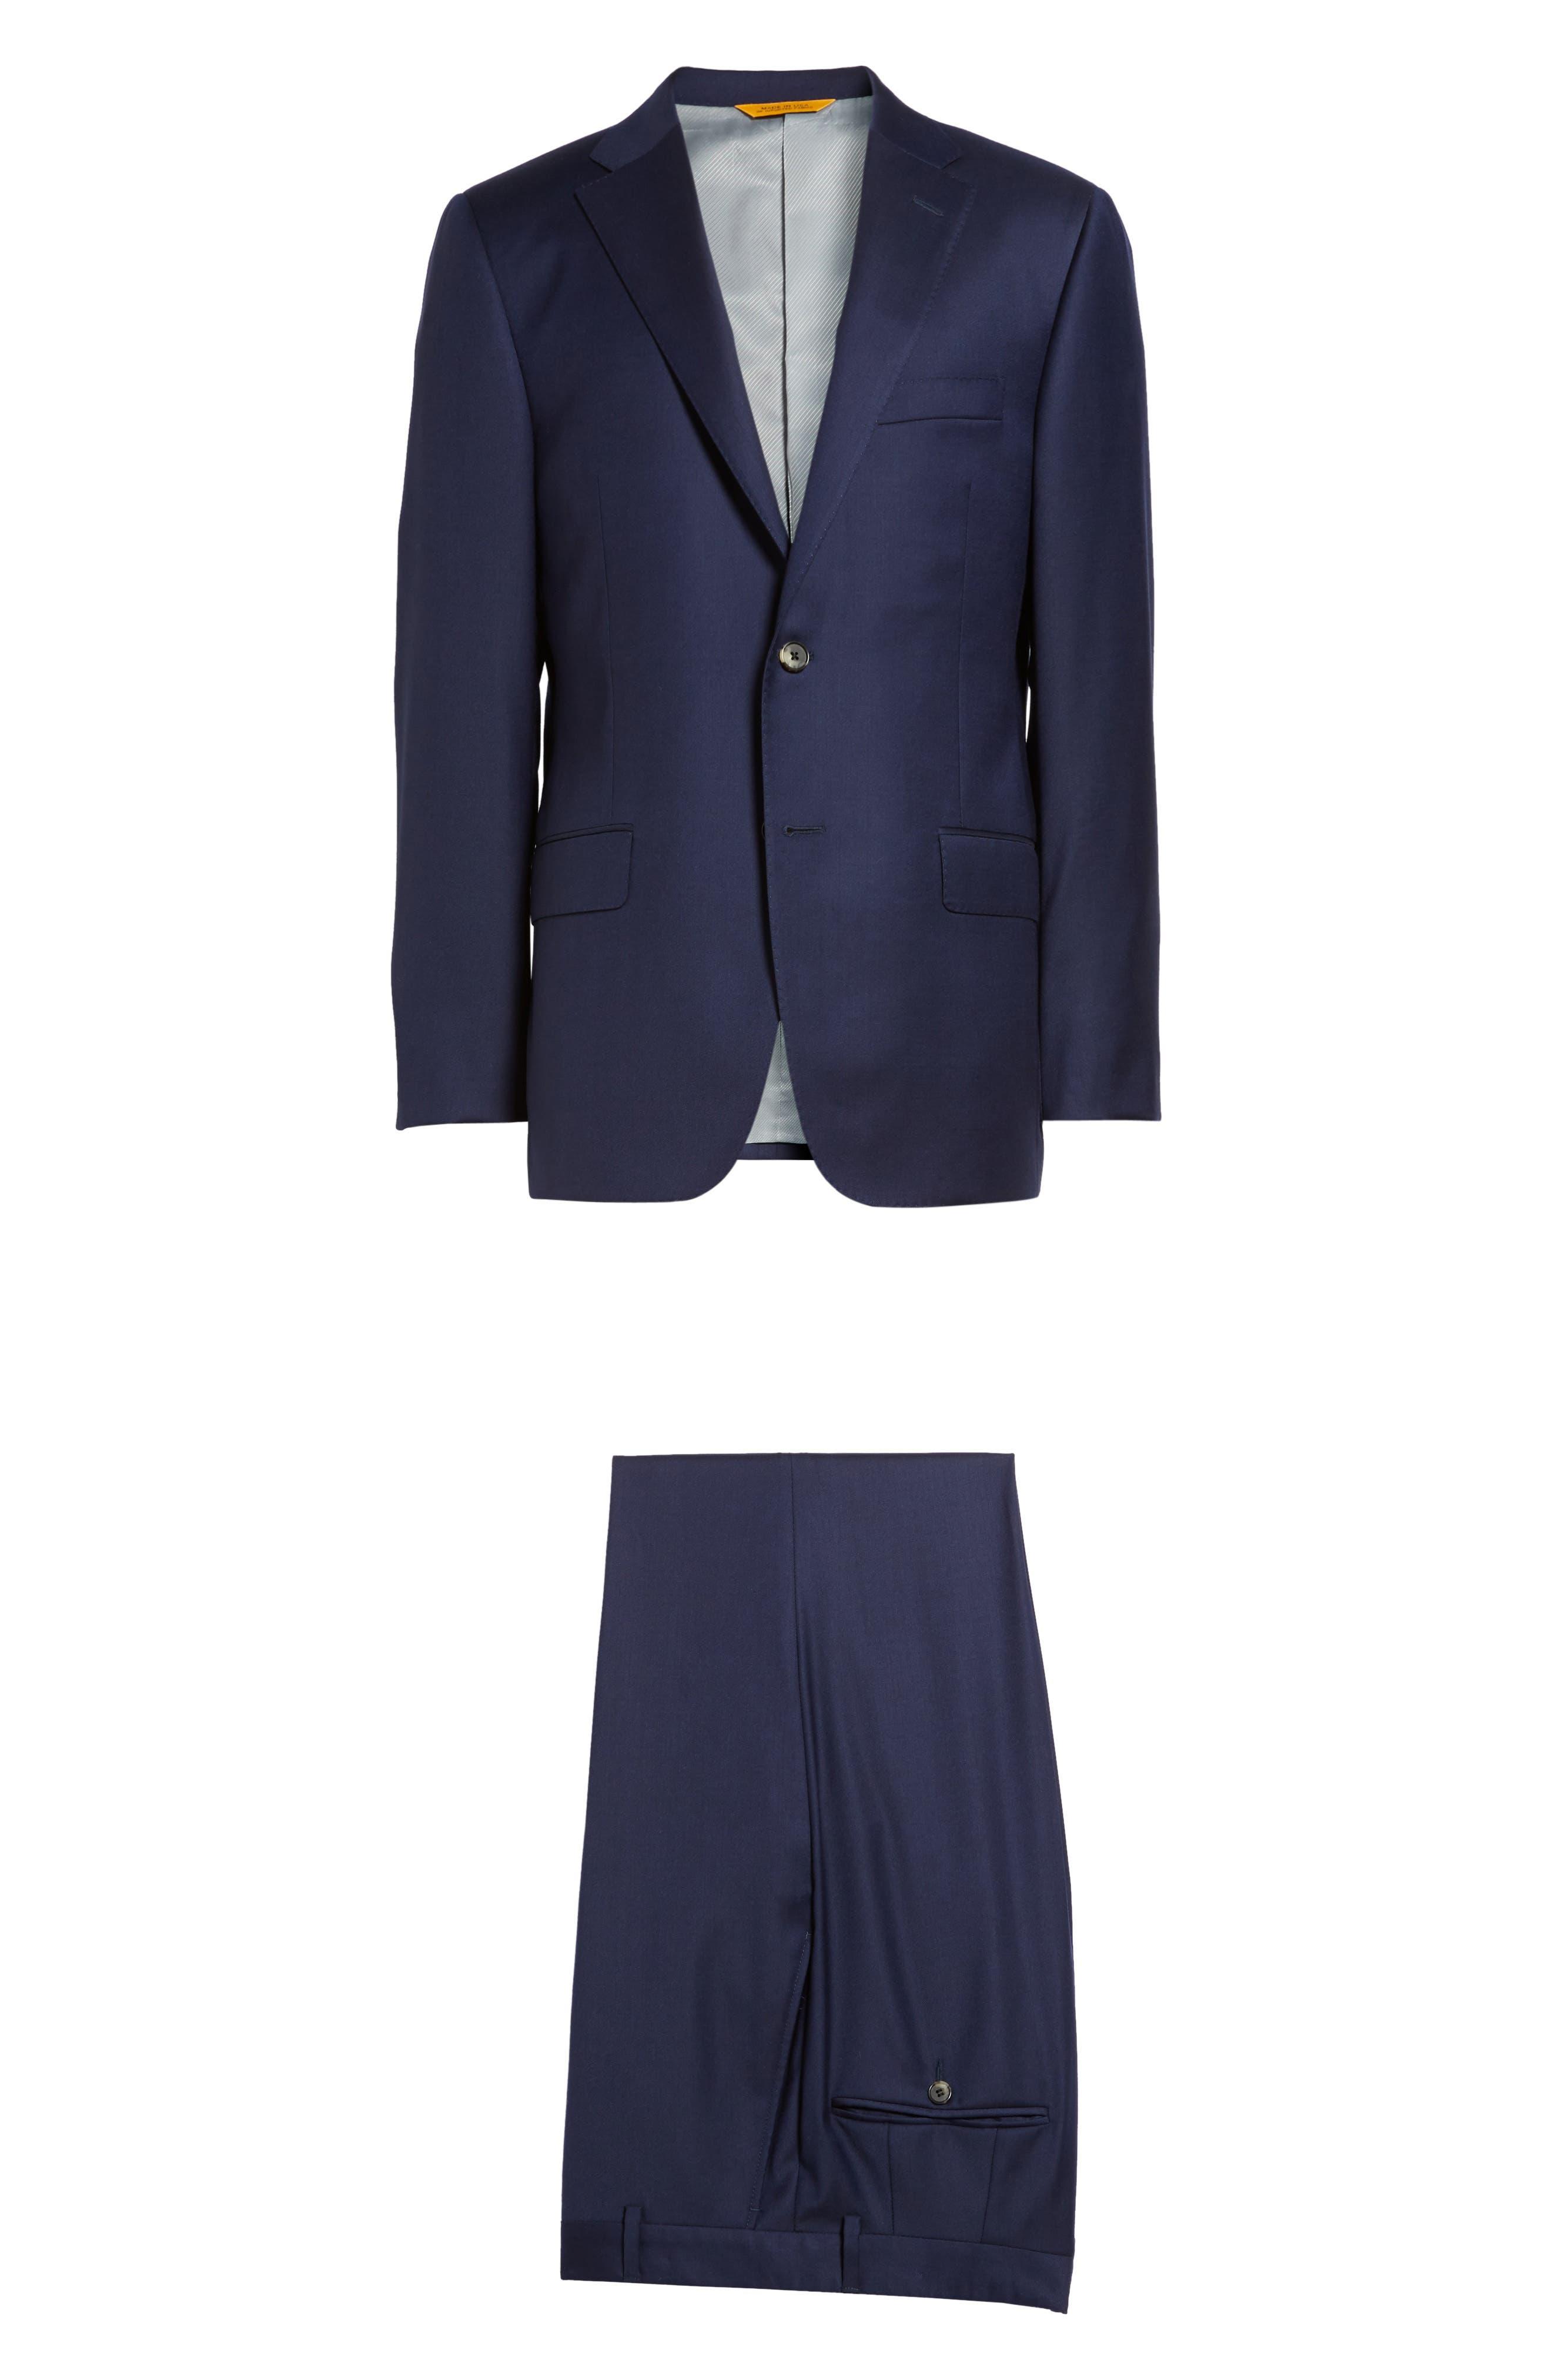 HICKEY FREEMAN, Classic B Fit Loro Piana Wool Suit, Alternate thumbnail 8, color, NAVY